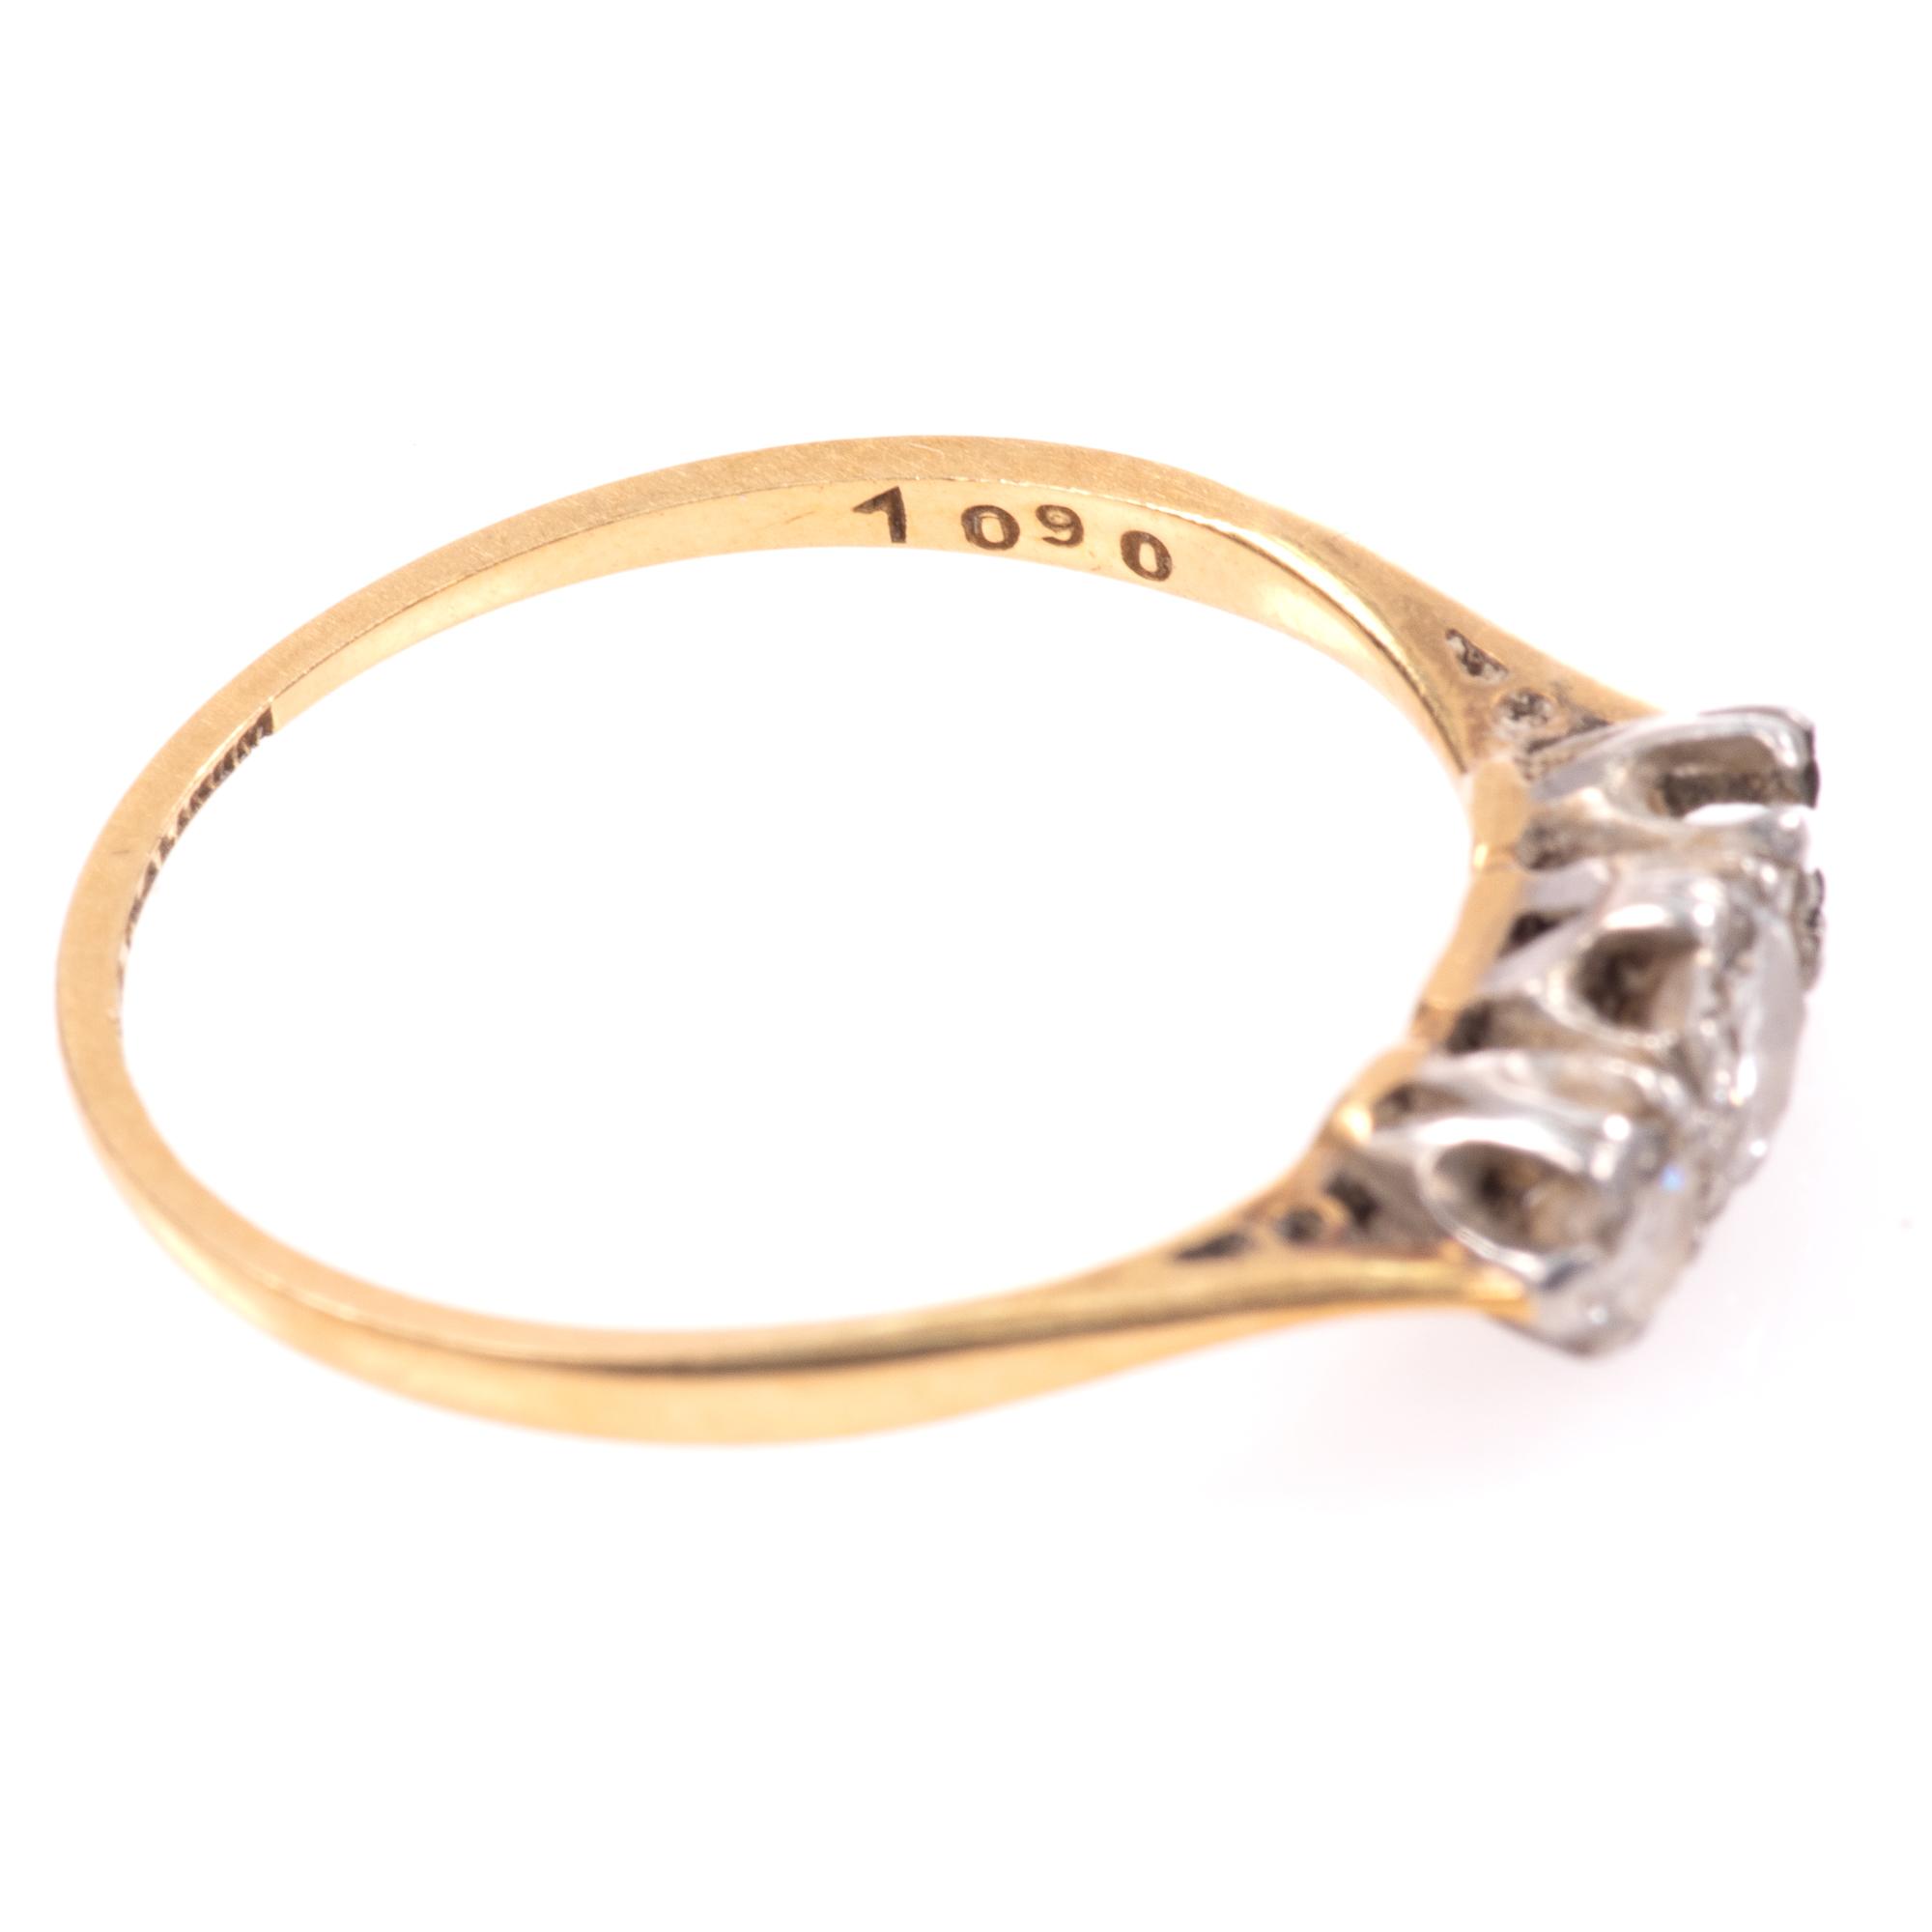 18ct Gold & Platinum 0.40ct Diamond Ring - Image 7 of 8